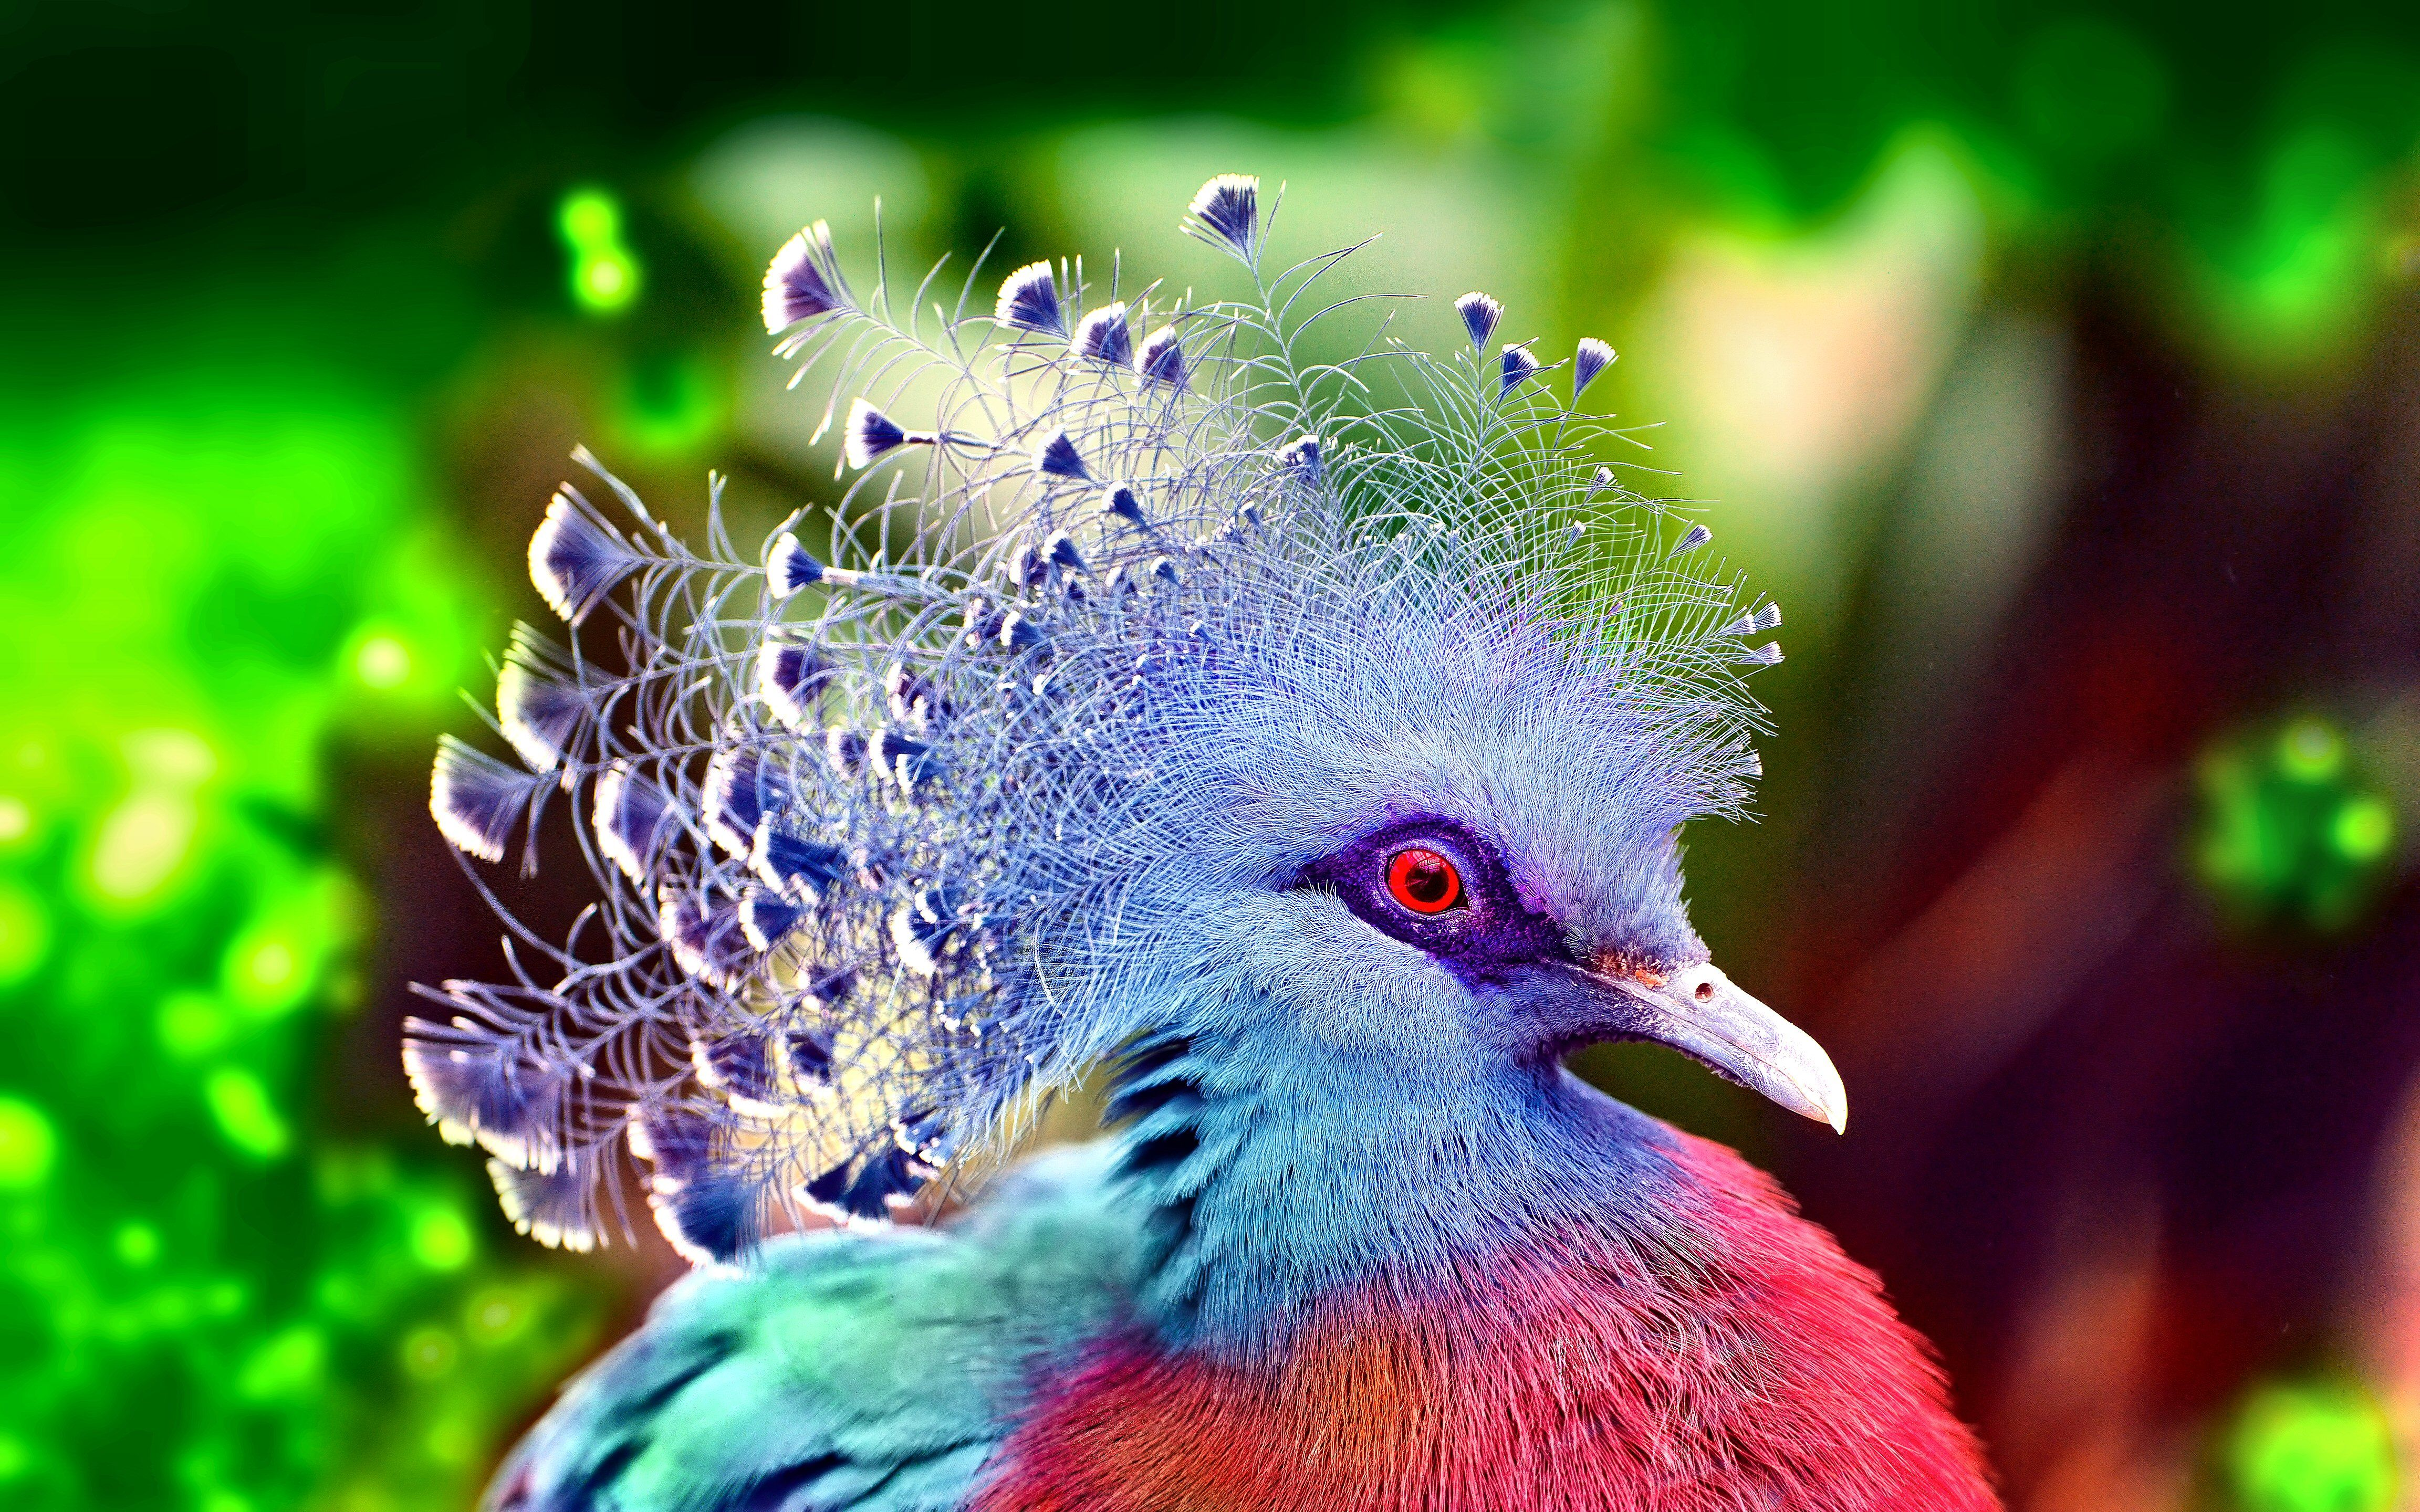 BIRD [19] coolbird [VersionOne031157] [29januari2013tuesday] Wallpaper/Background 4608 x 2880 - id: 351185 - Wallpaper Abyss